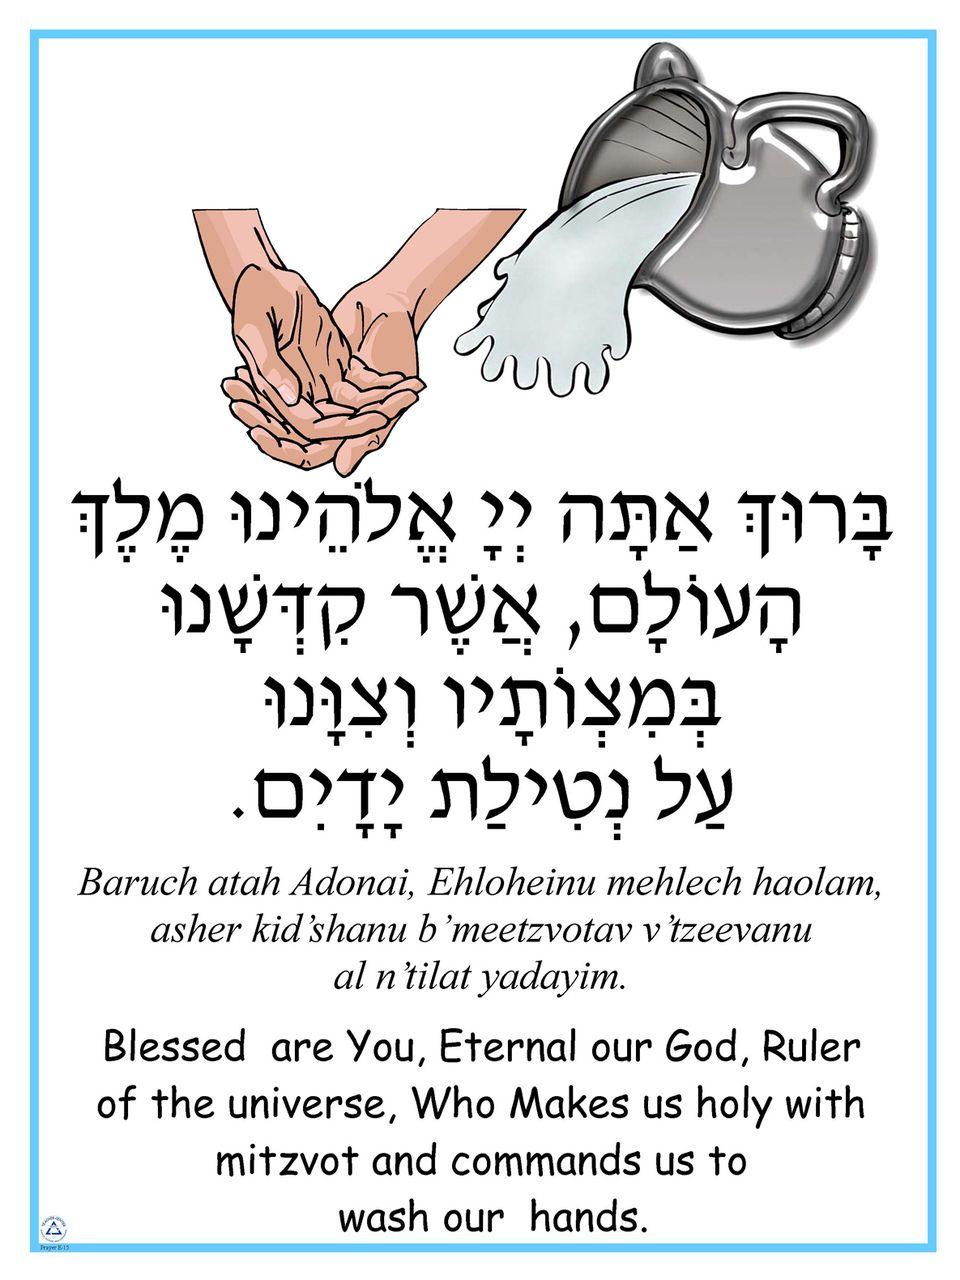 Netilat yadayim morning prayer